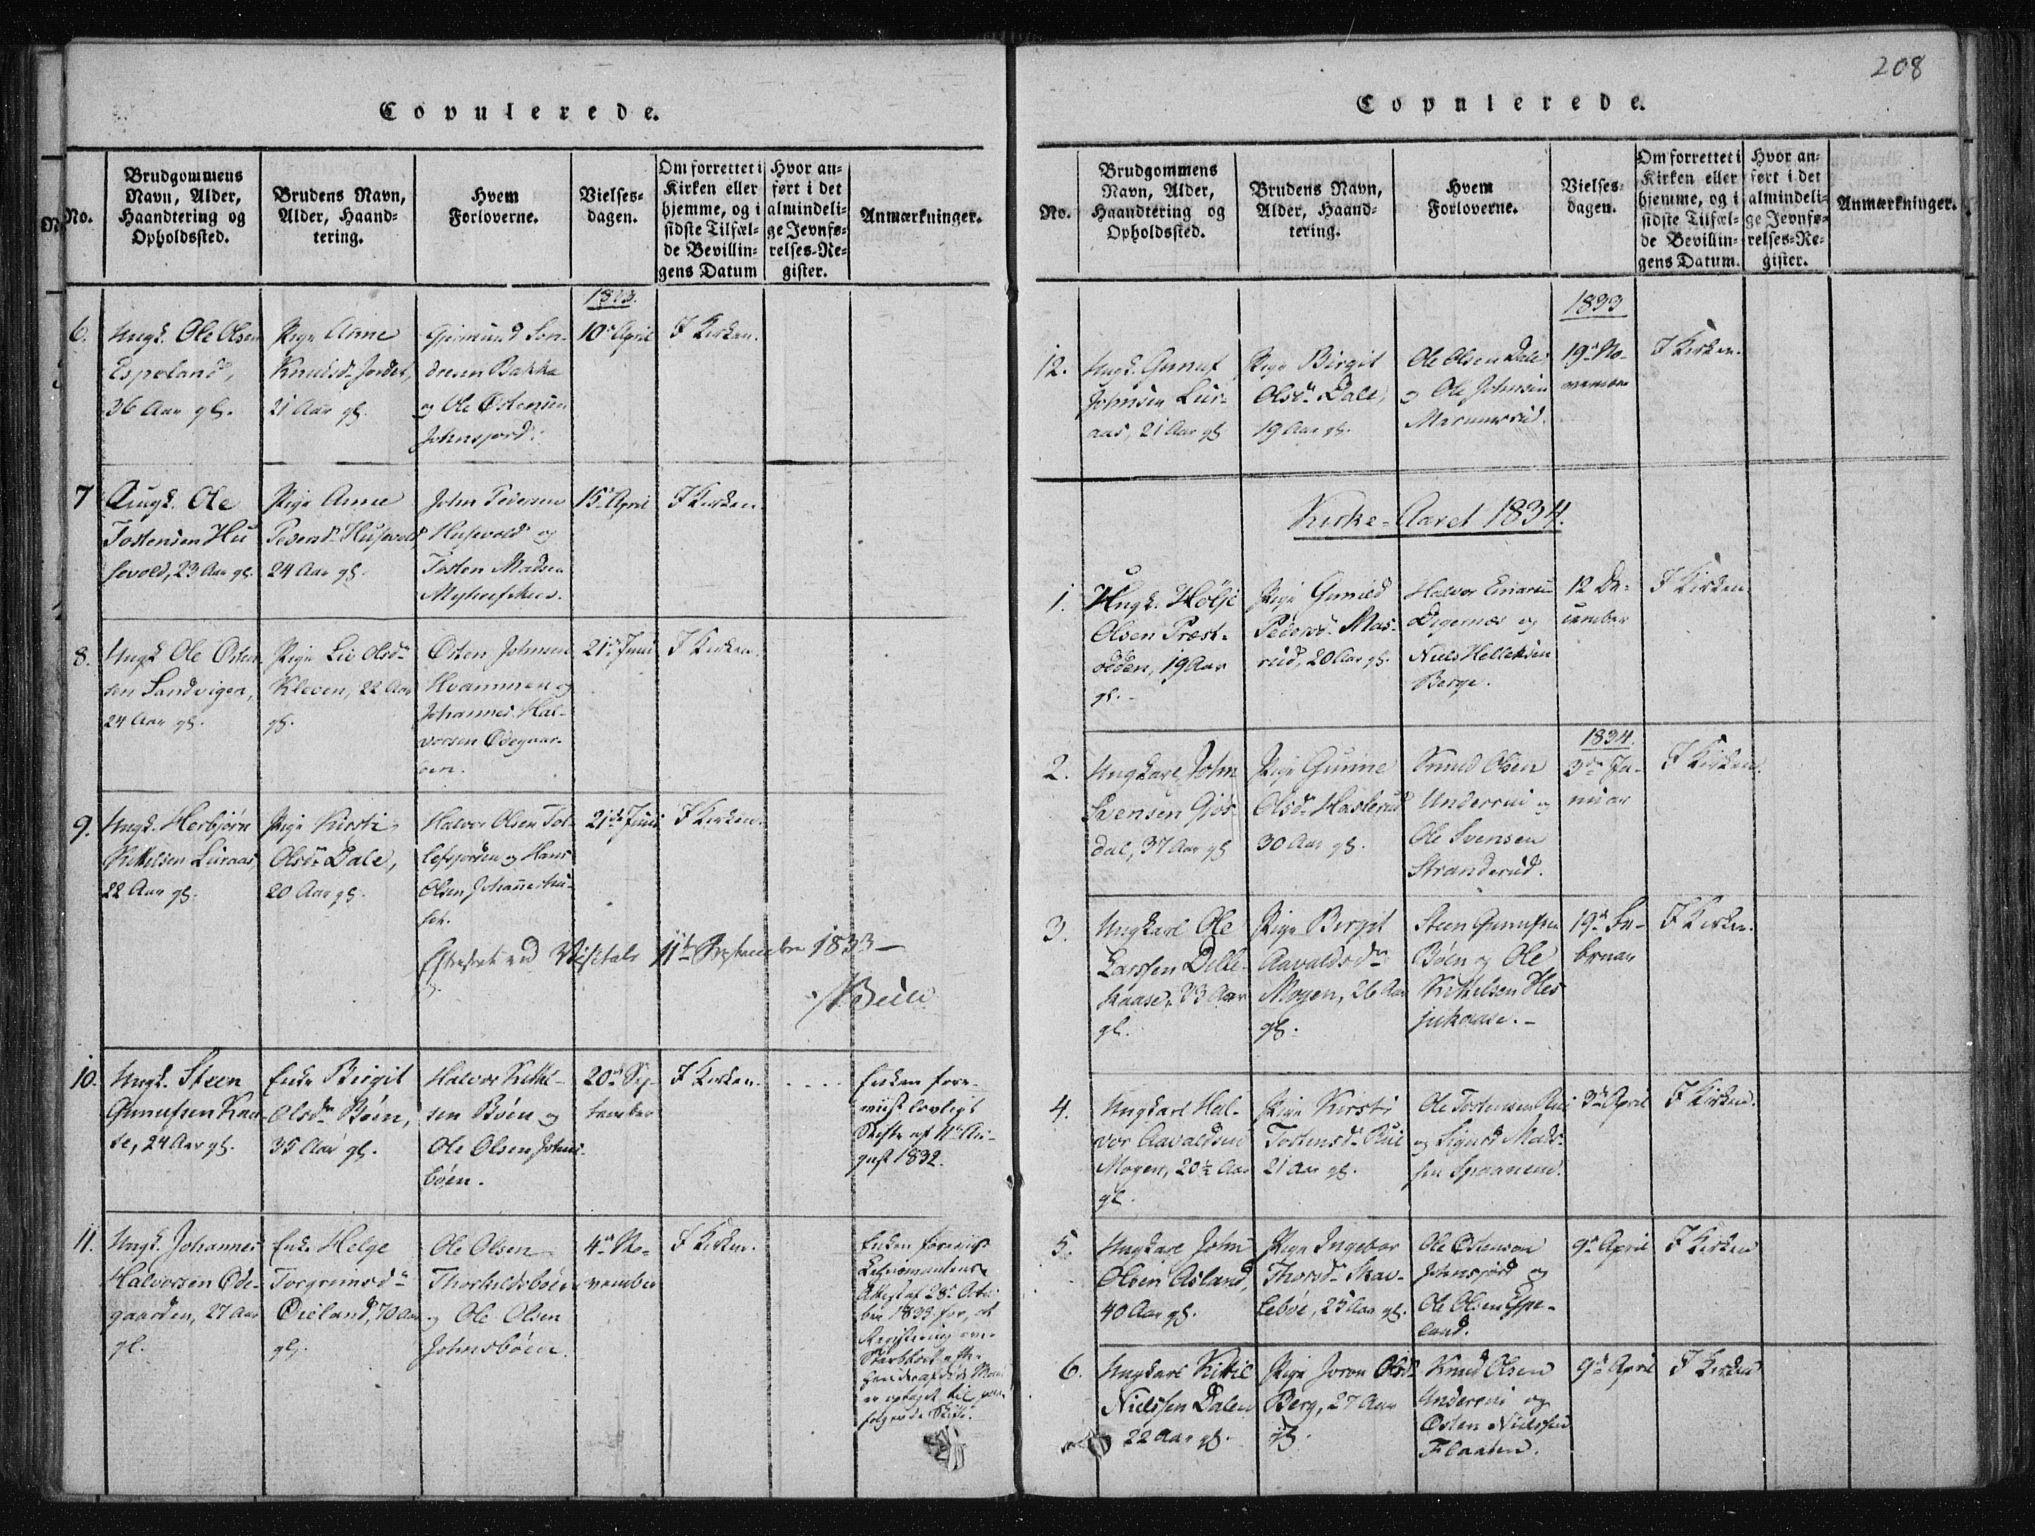 SAKO, Tinn kirkebøker, F/Fa/L0004: Ministerialbok nr. I 4, 1815-1843, s. 208